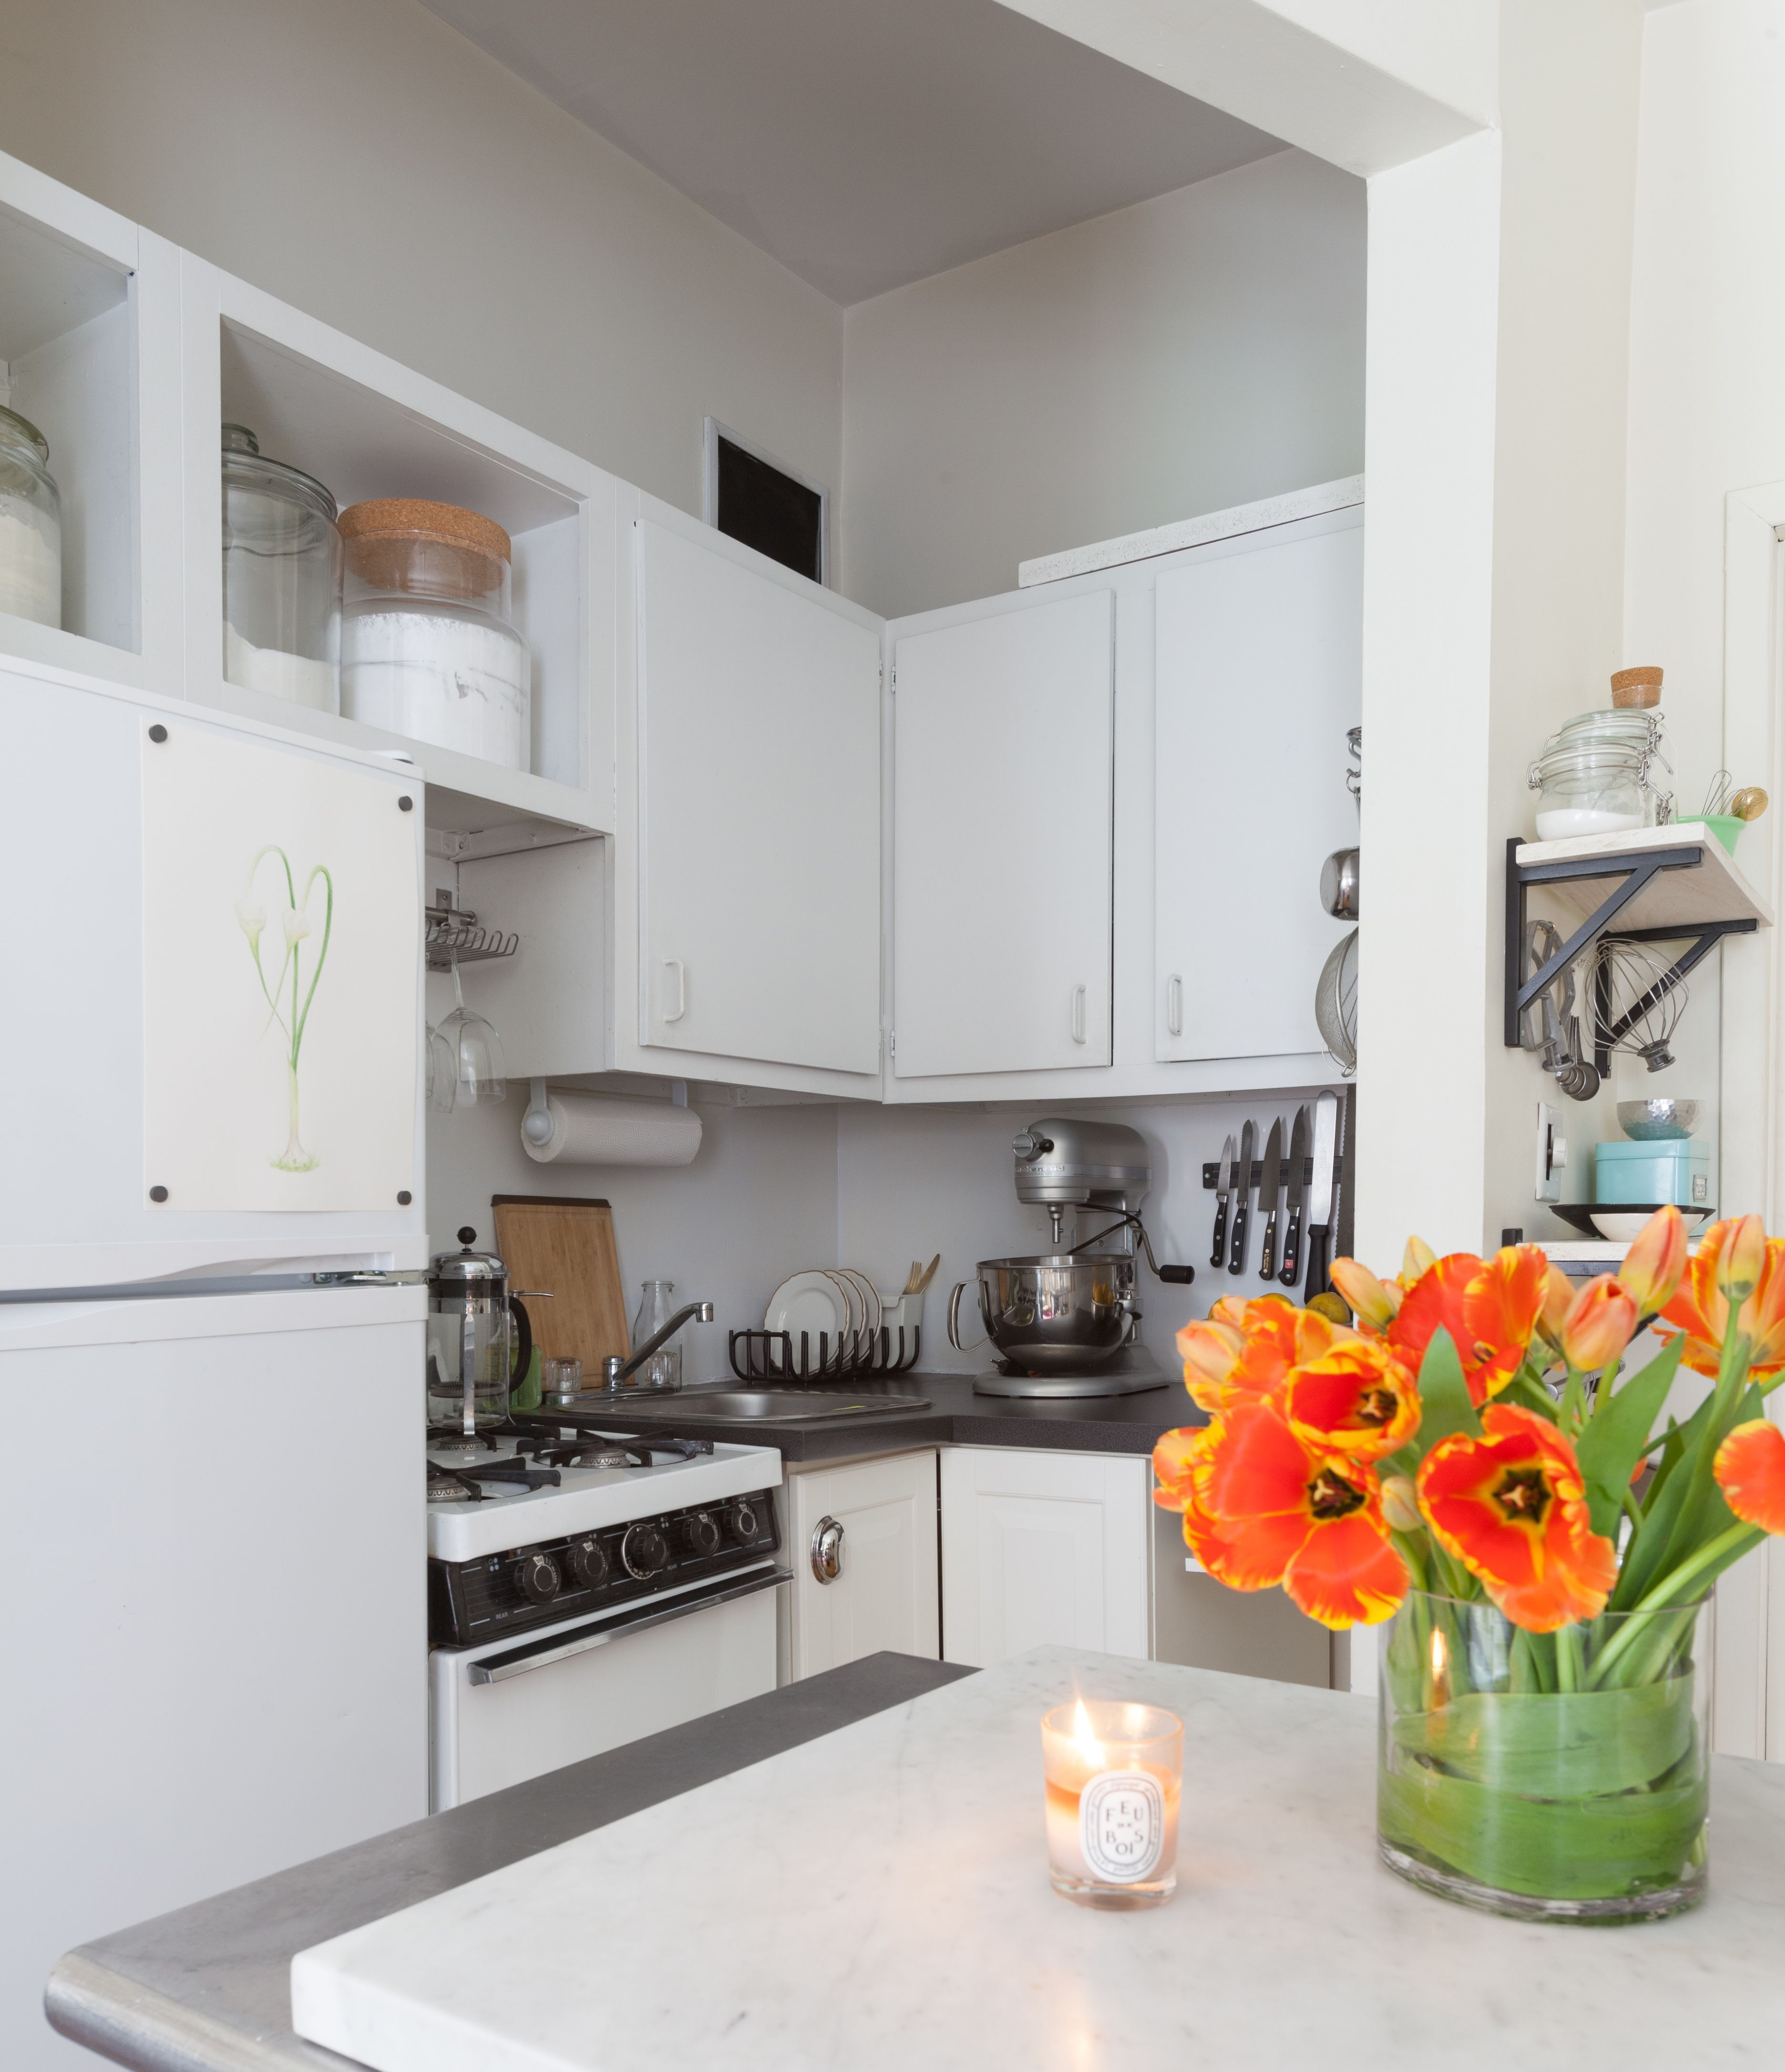 Pin it nyc studio apartments small apartments new kitchen kitchen island kitchen